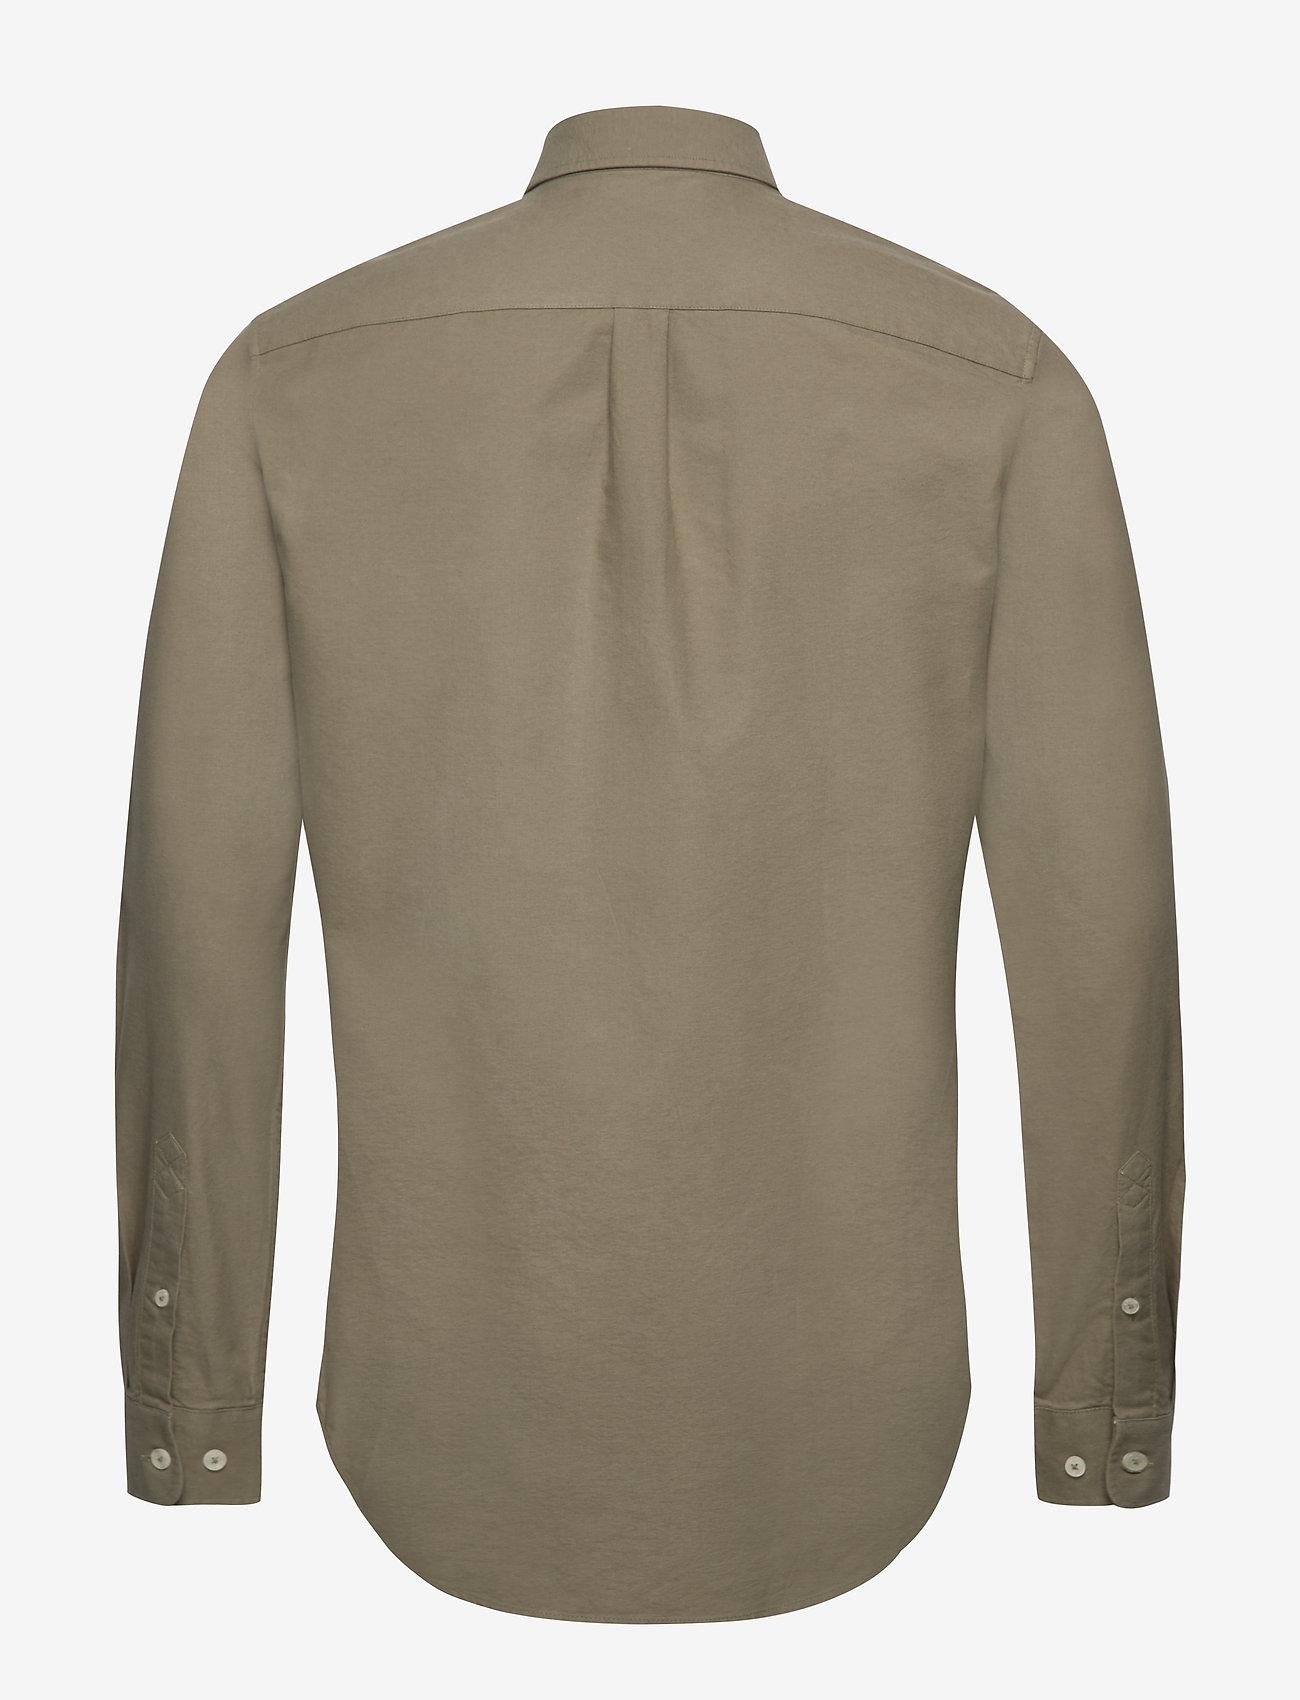 Liam Bx Shirt 11389 (Deep Lichen Green) - Samsøe Samsøe onwGZd